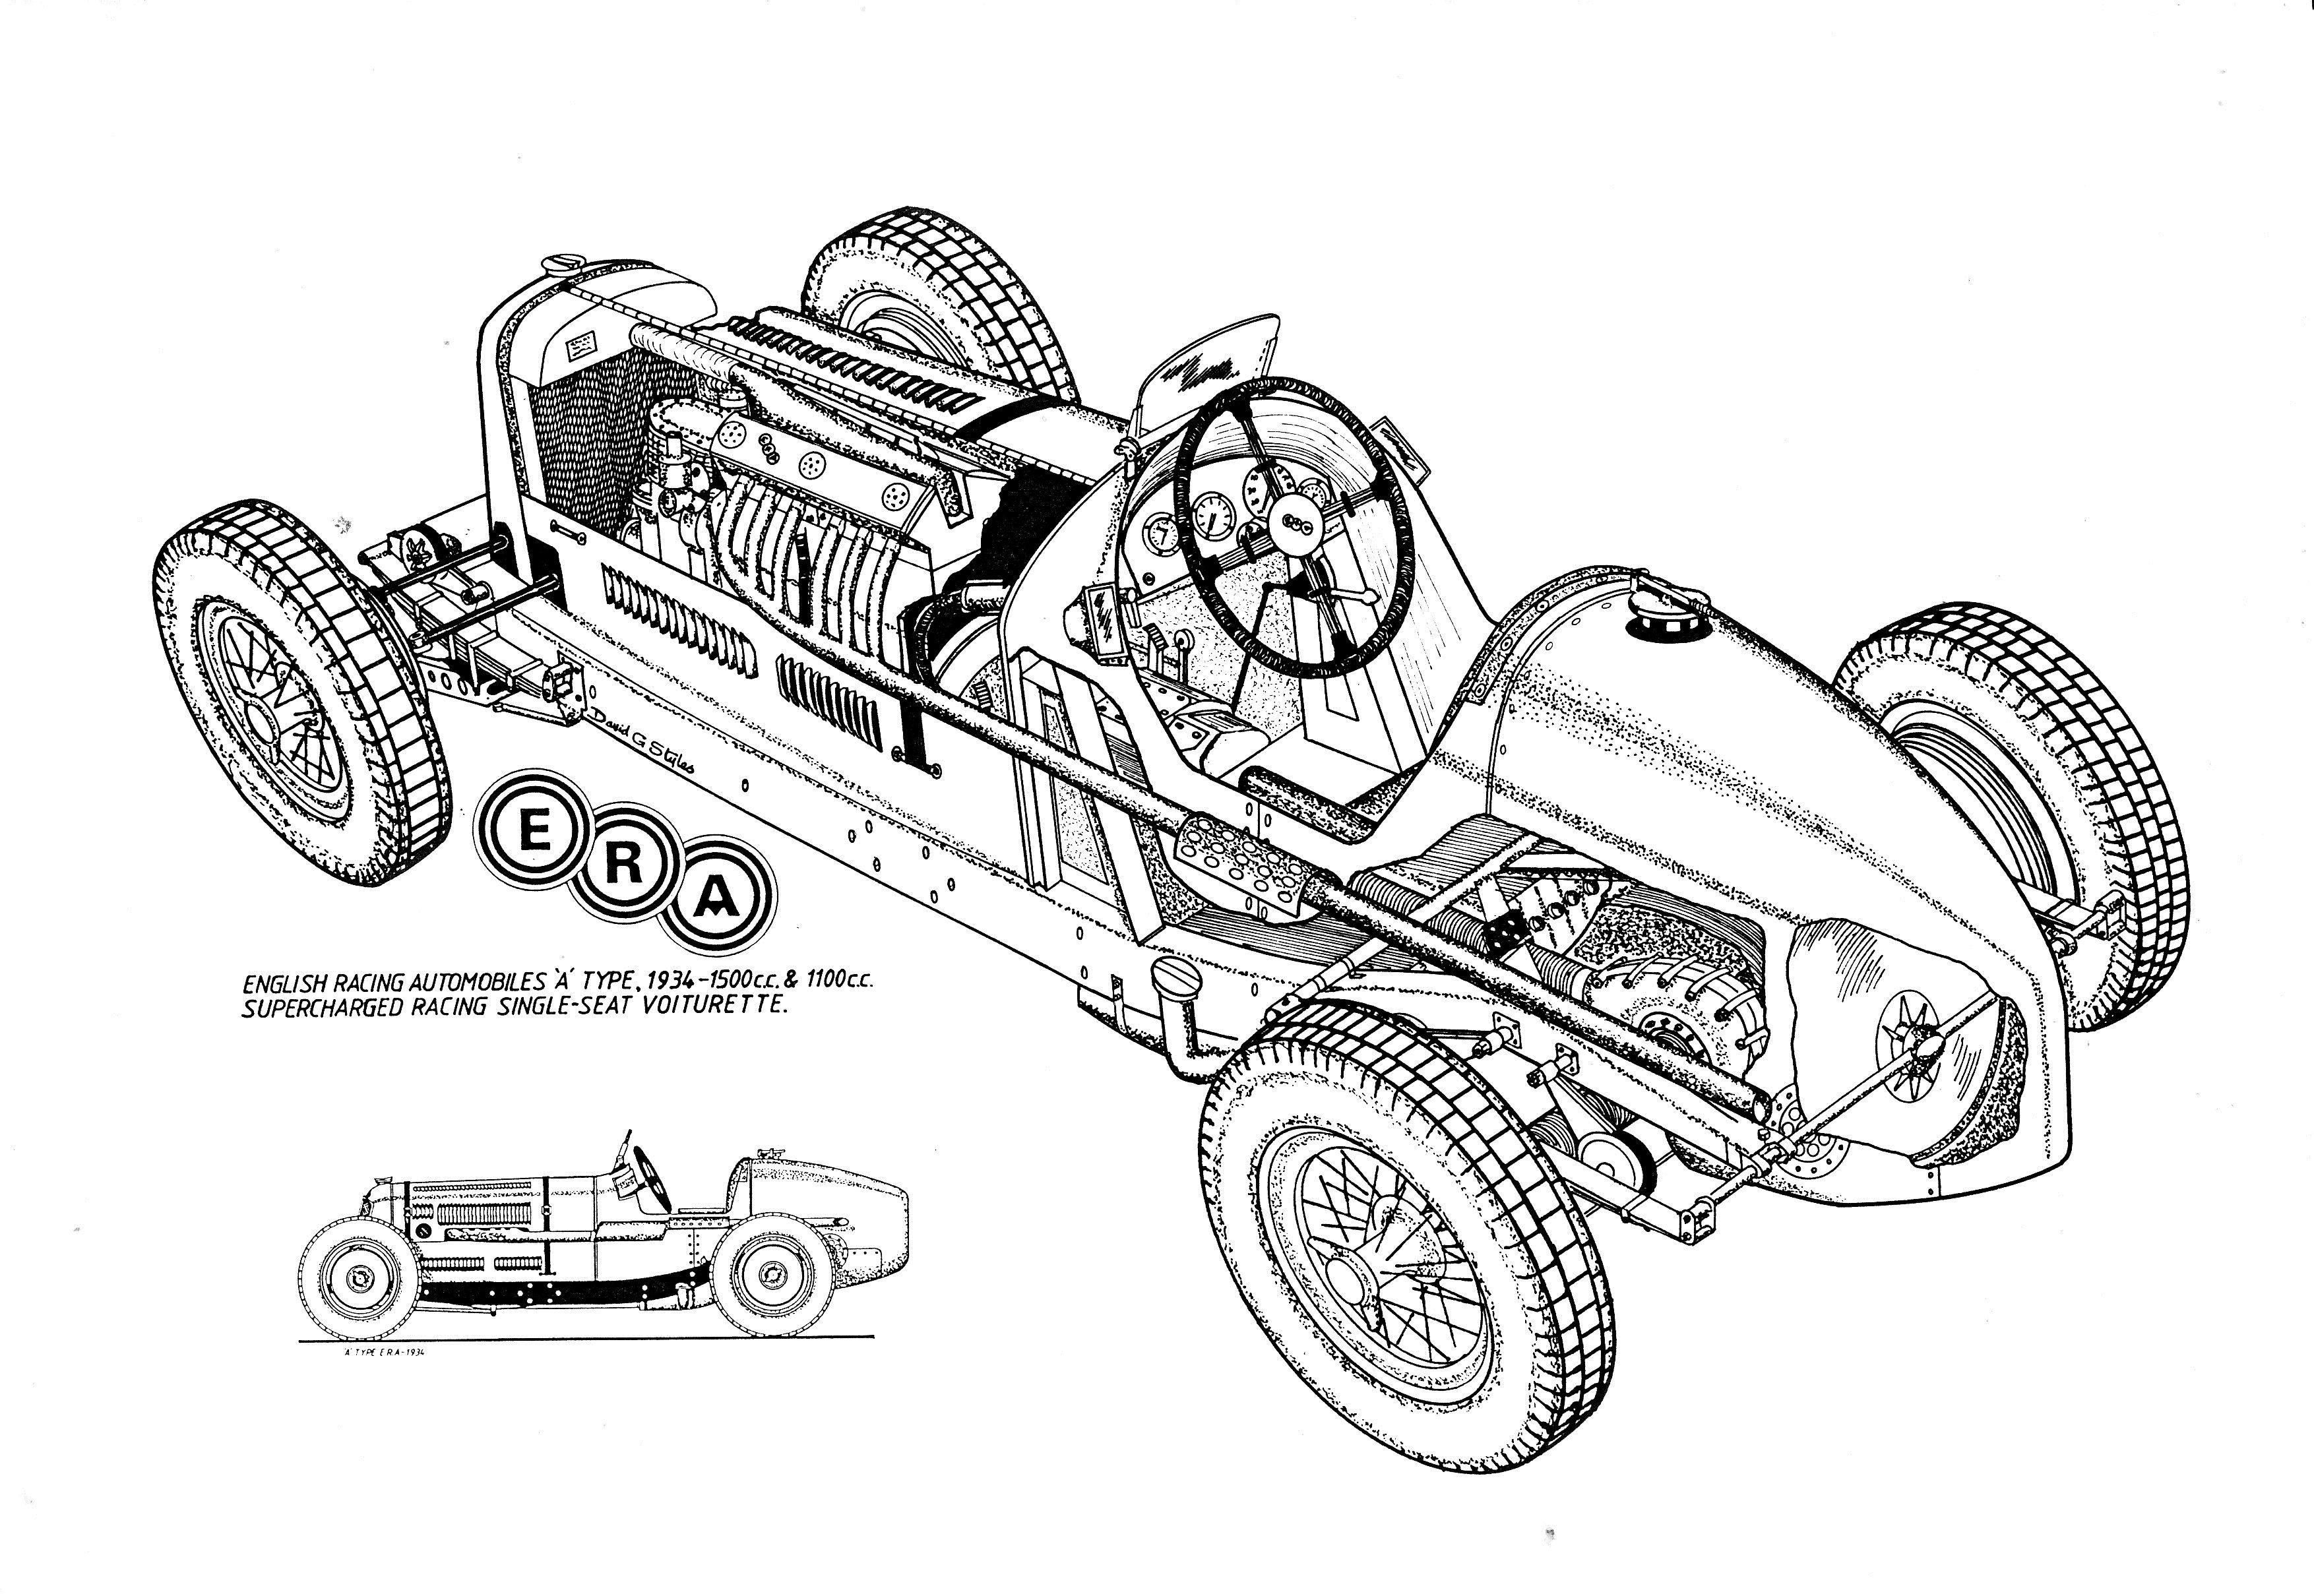 1934 ERA (English Racing Automobiles) Type R1A 1500cc